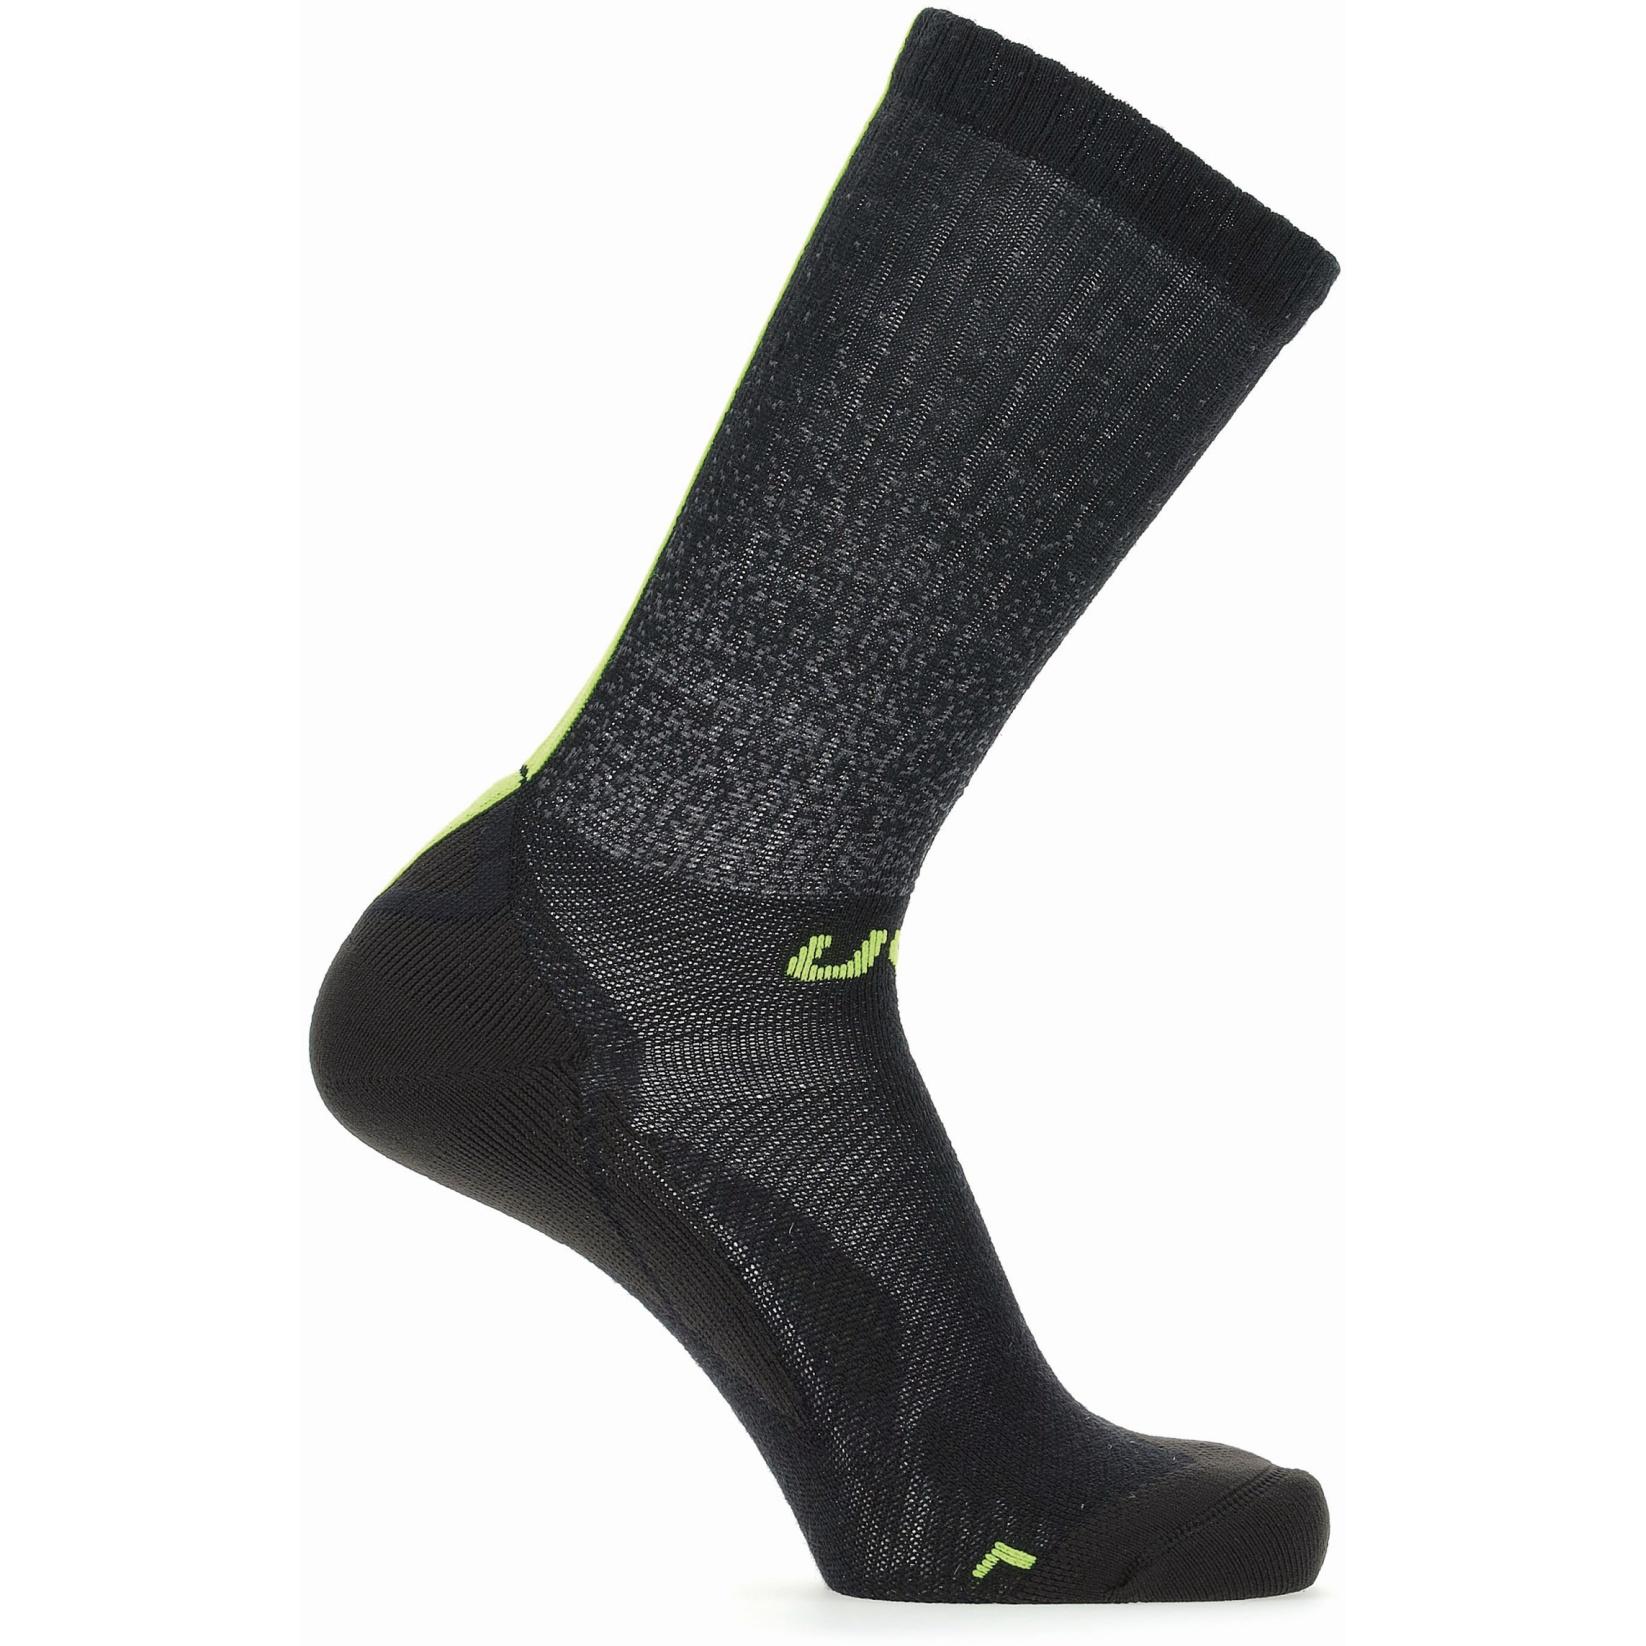 Bild von UYN Cycling Aero Winter Socken - Black/Lime